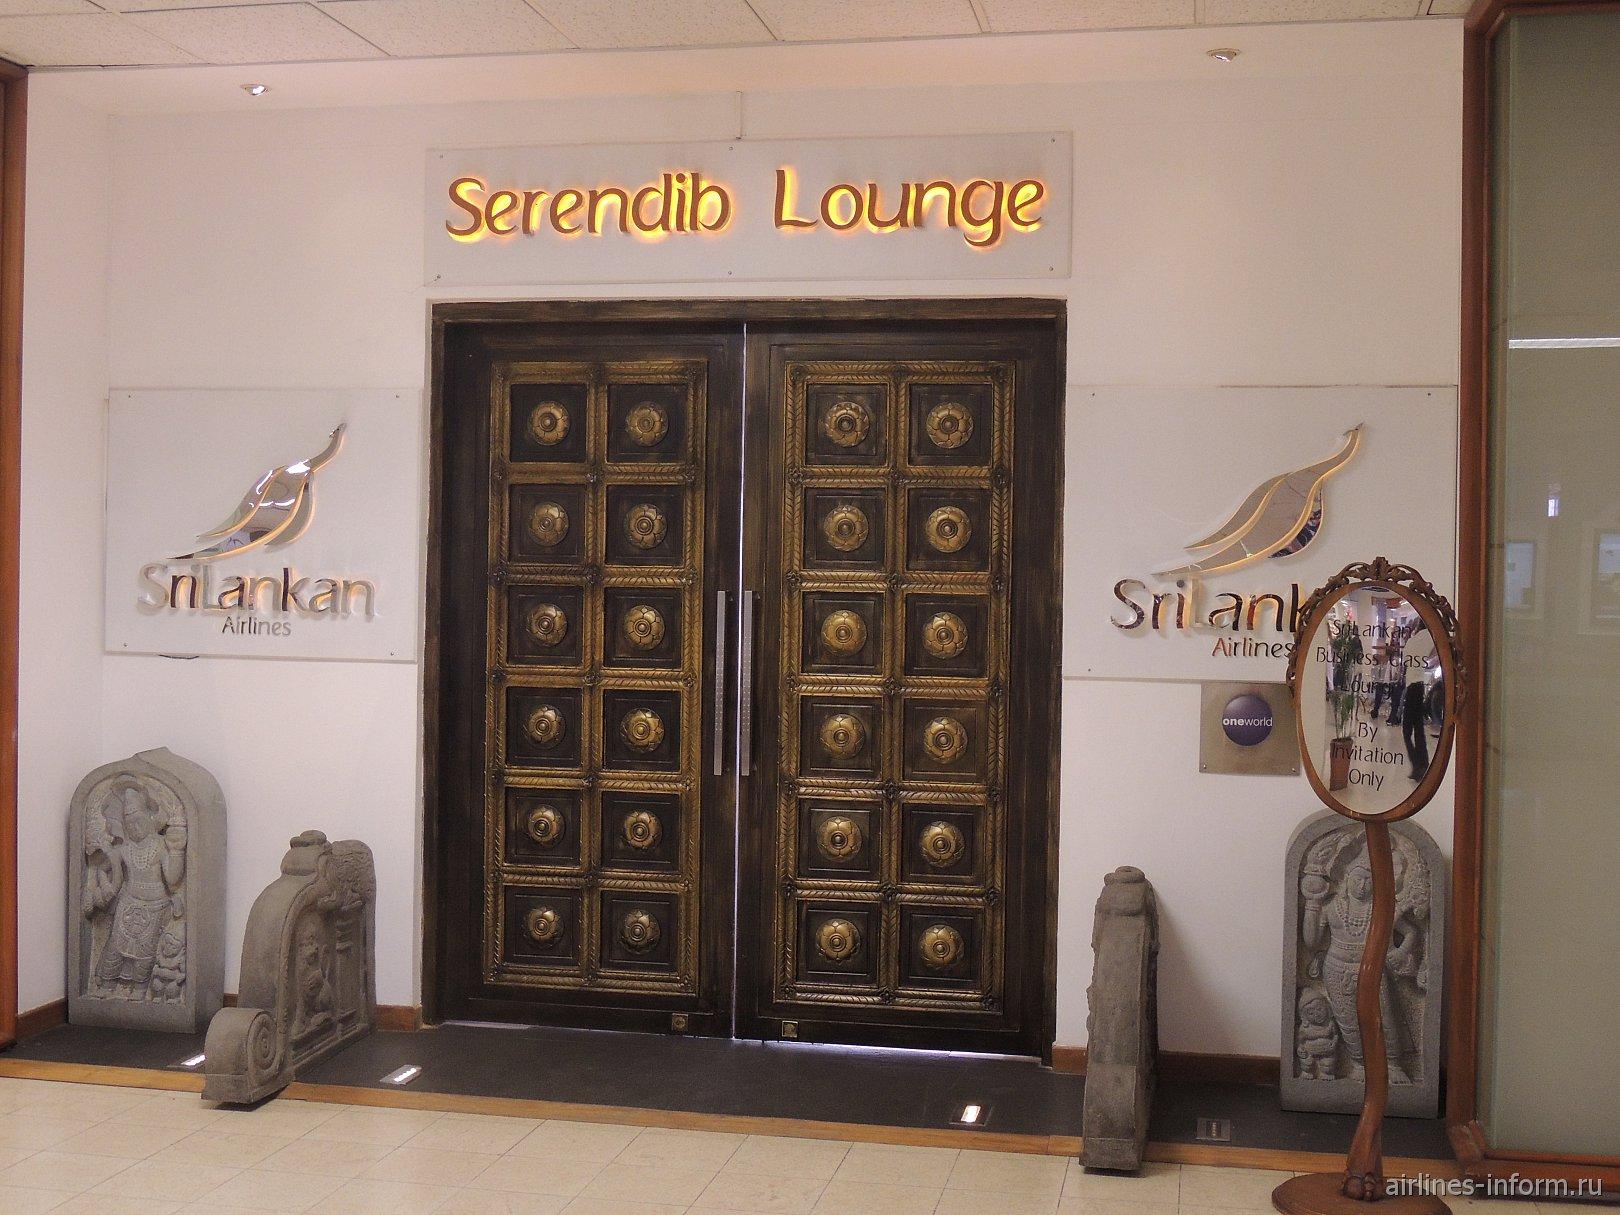 Вход в бизнес-зал SriLankan Airlines в аэропорту Коломбо